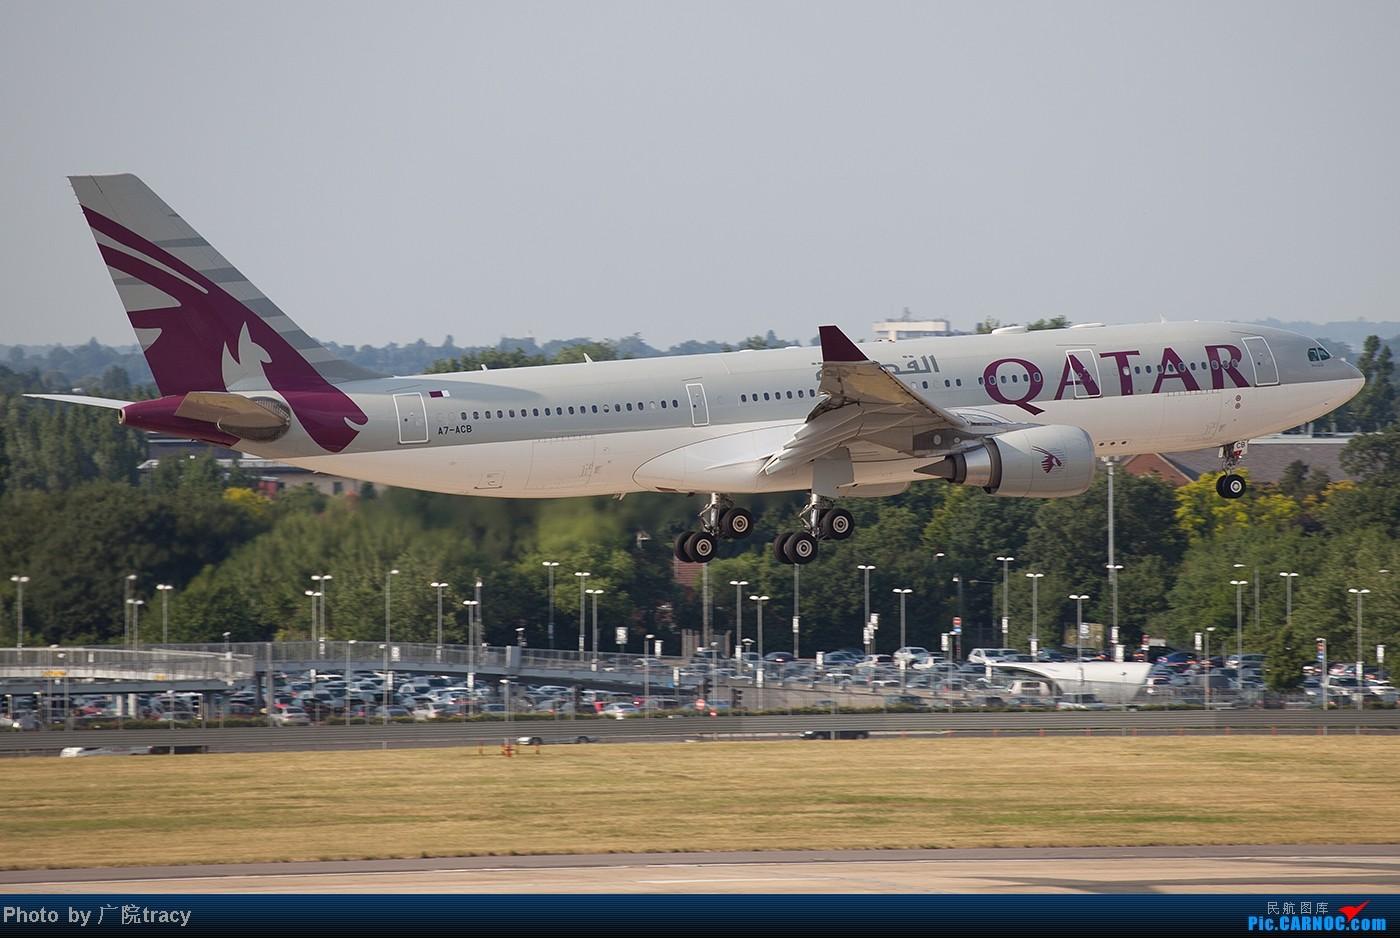 Re:[原创]★ ★ ★ ★ ★中东的航空公司在伦敦希斯罗国际机场  ★ ★ ★ ★ ★ AIRBUS A330-200 A7-ACB 英国伦敦希思罗机场